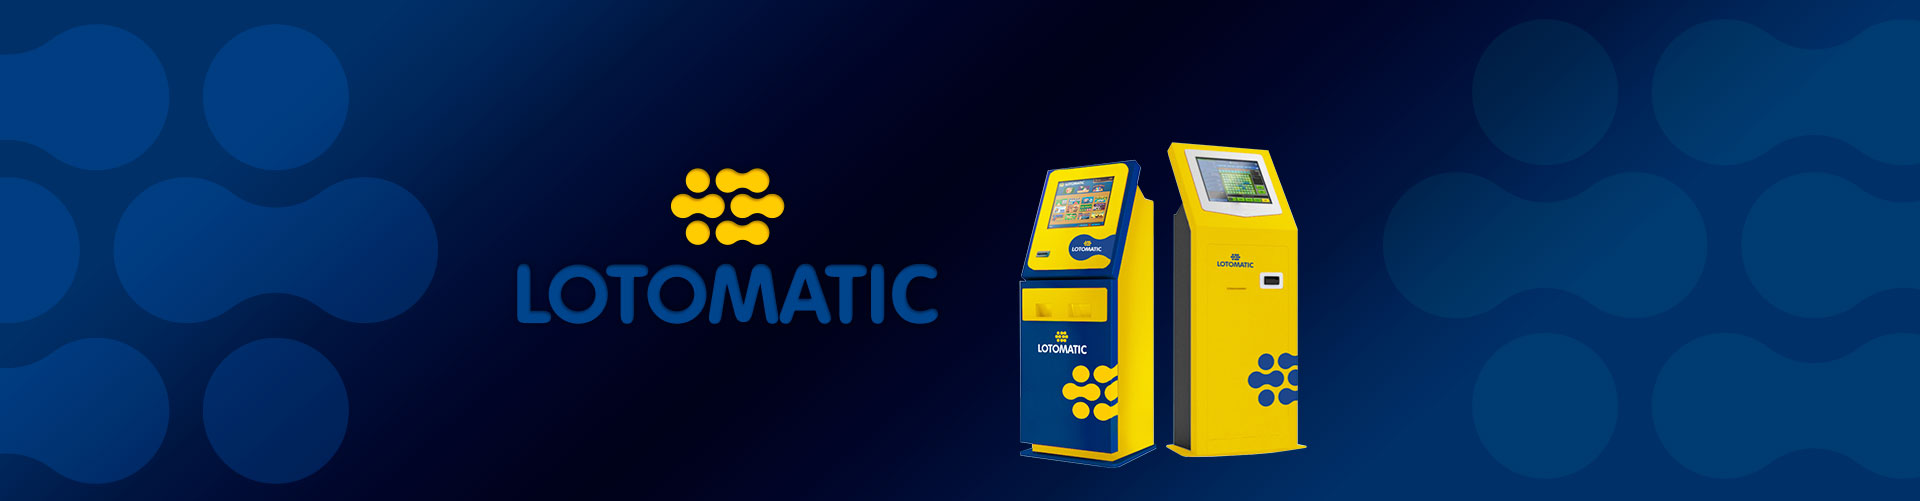 Lotomatic Лотоматик Терминал